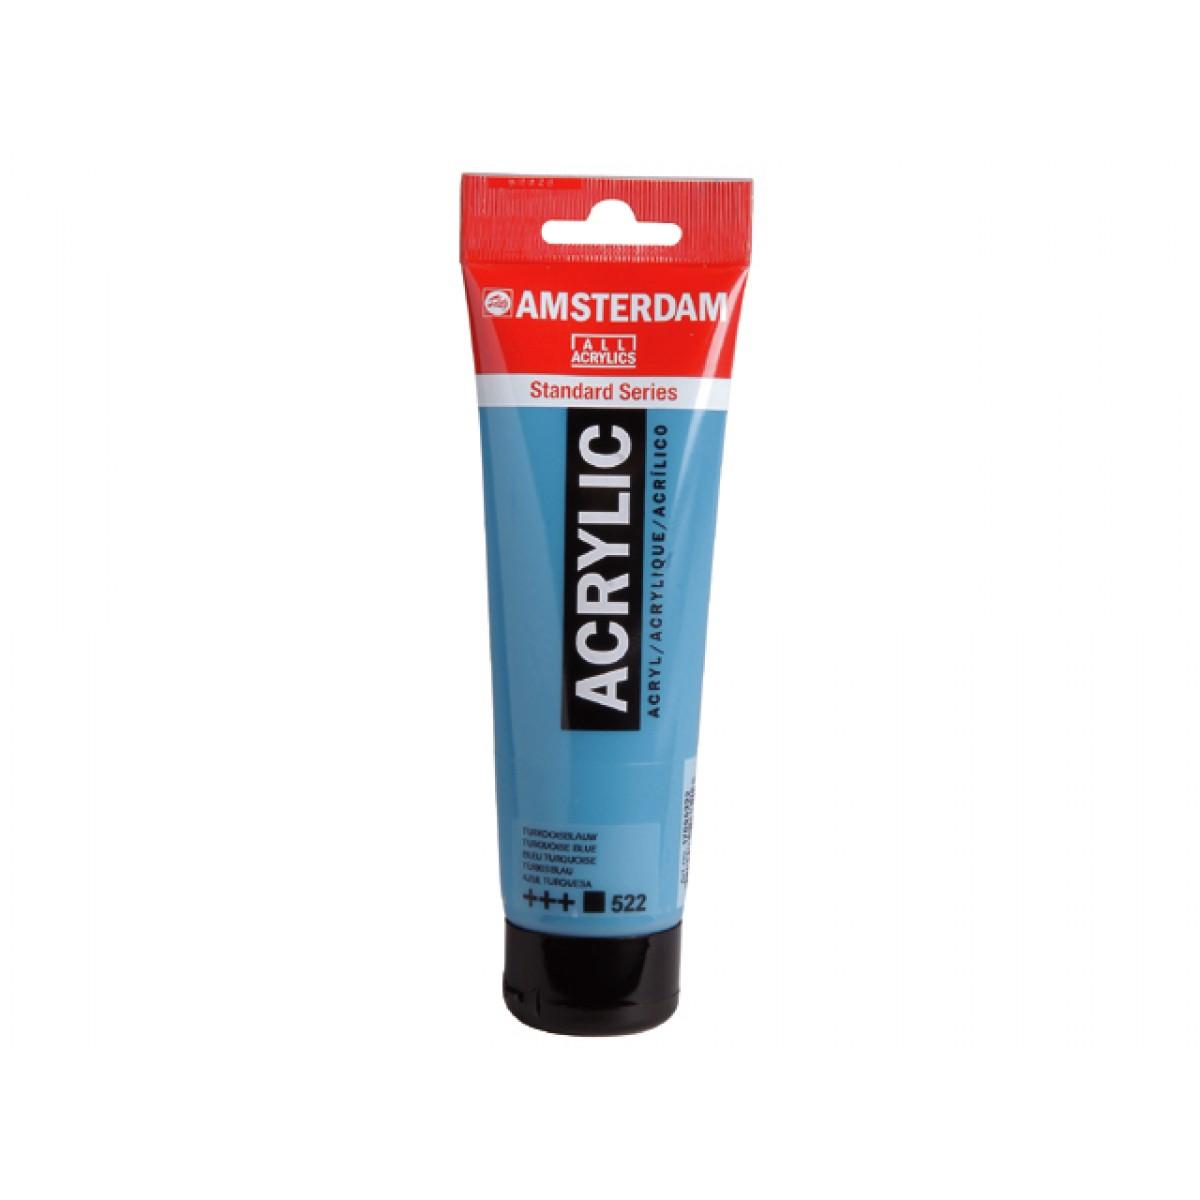 AMSTERDAMakrylmaling120mlFASTLAVPRIS-01